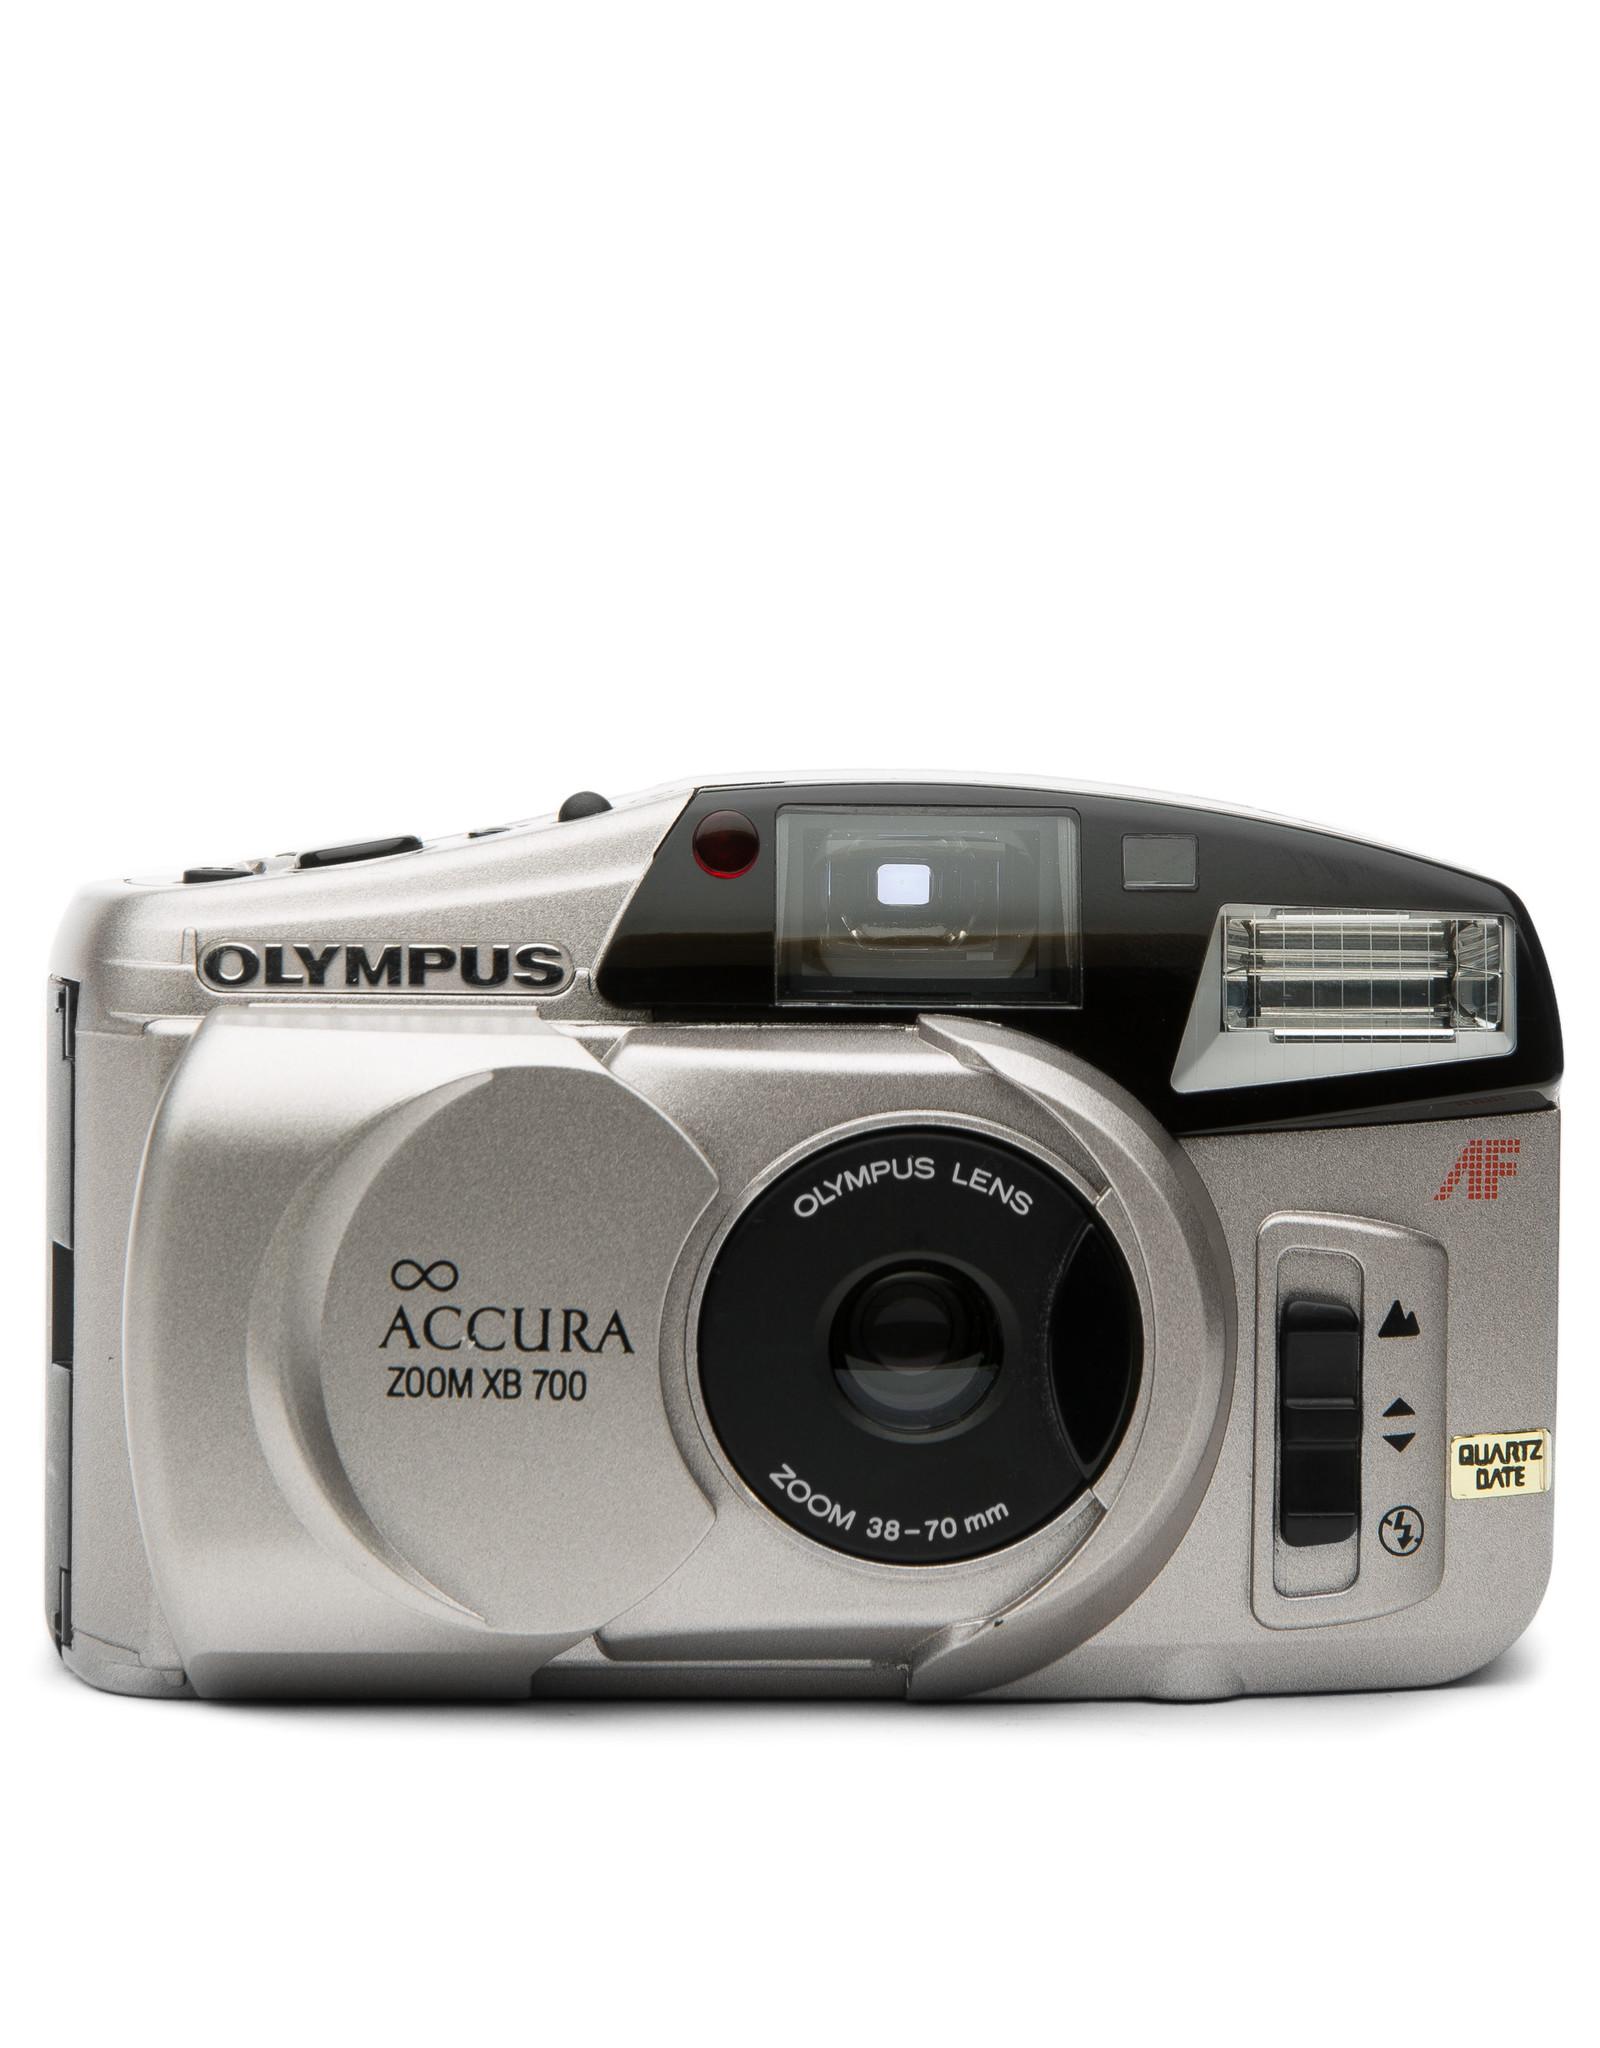 Olympus OLYMPUS ACCURA ZOOM XB70 COMPACT CAMERA